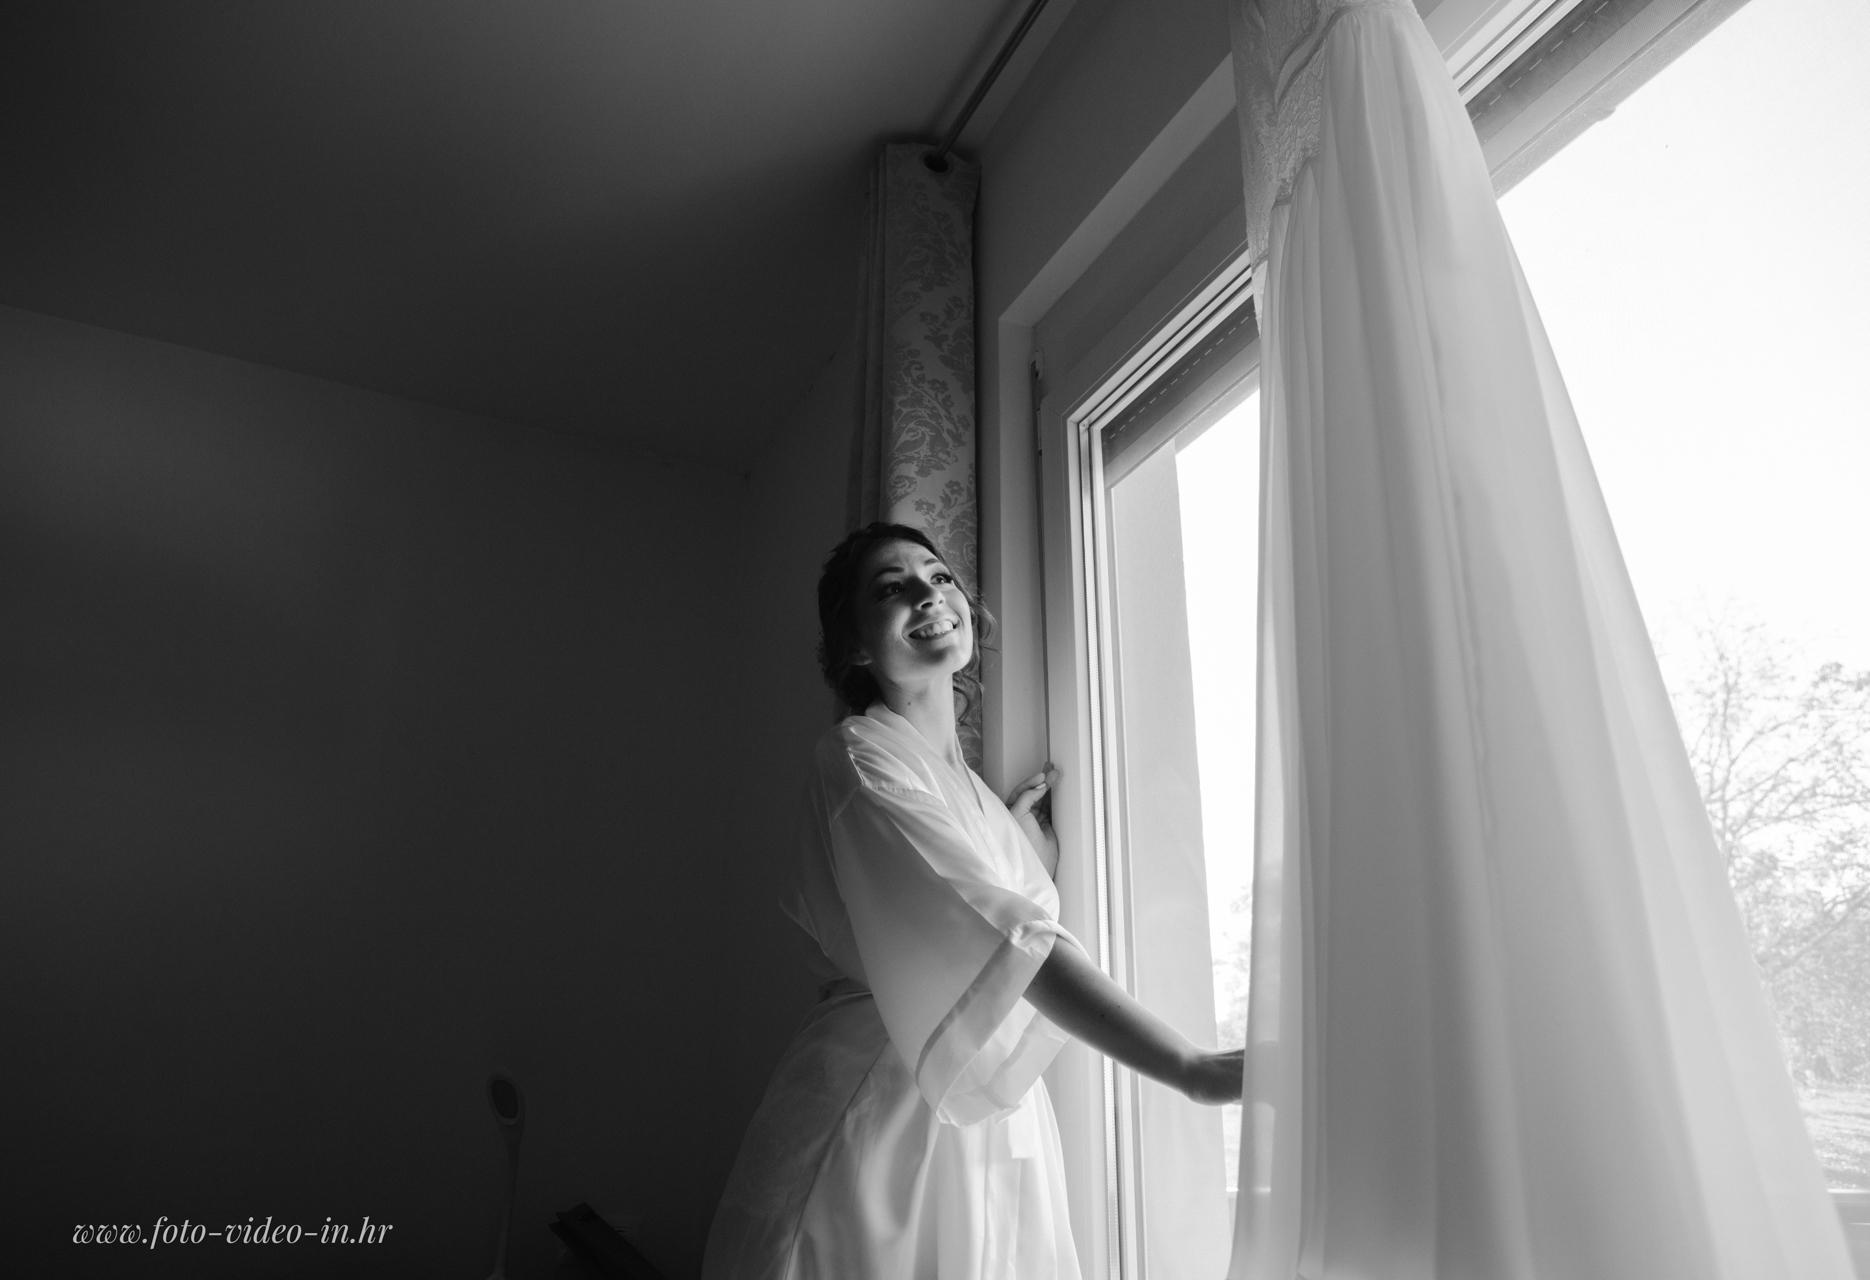 mladenka uz prozor